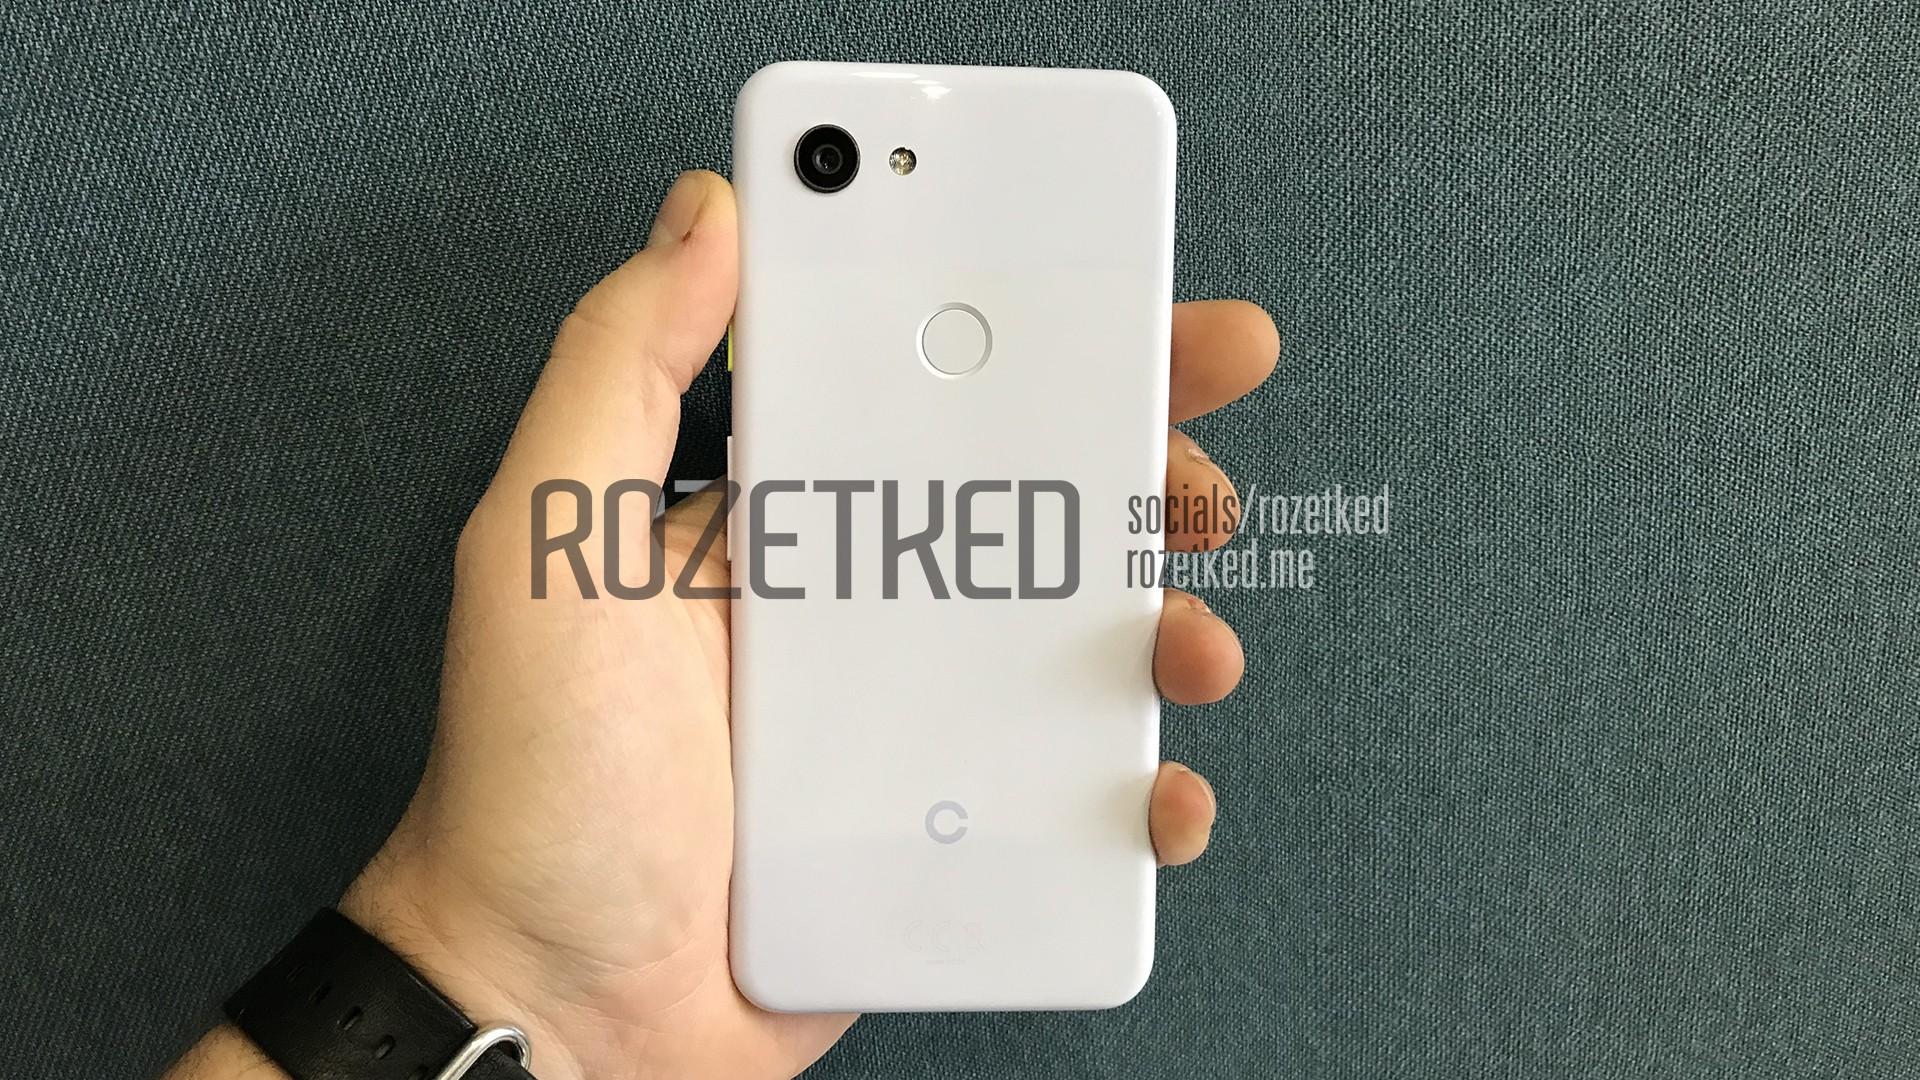 Google Pixel 3 Lite with Snapdragon 670, 3.5mm headphone jack Leaked